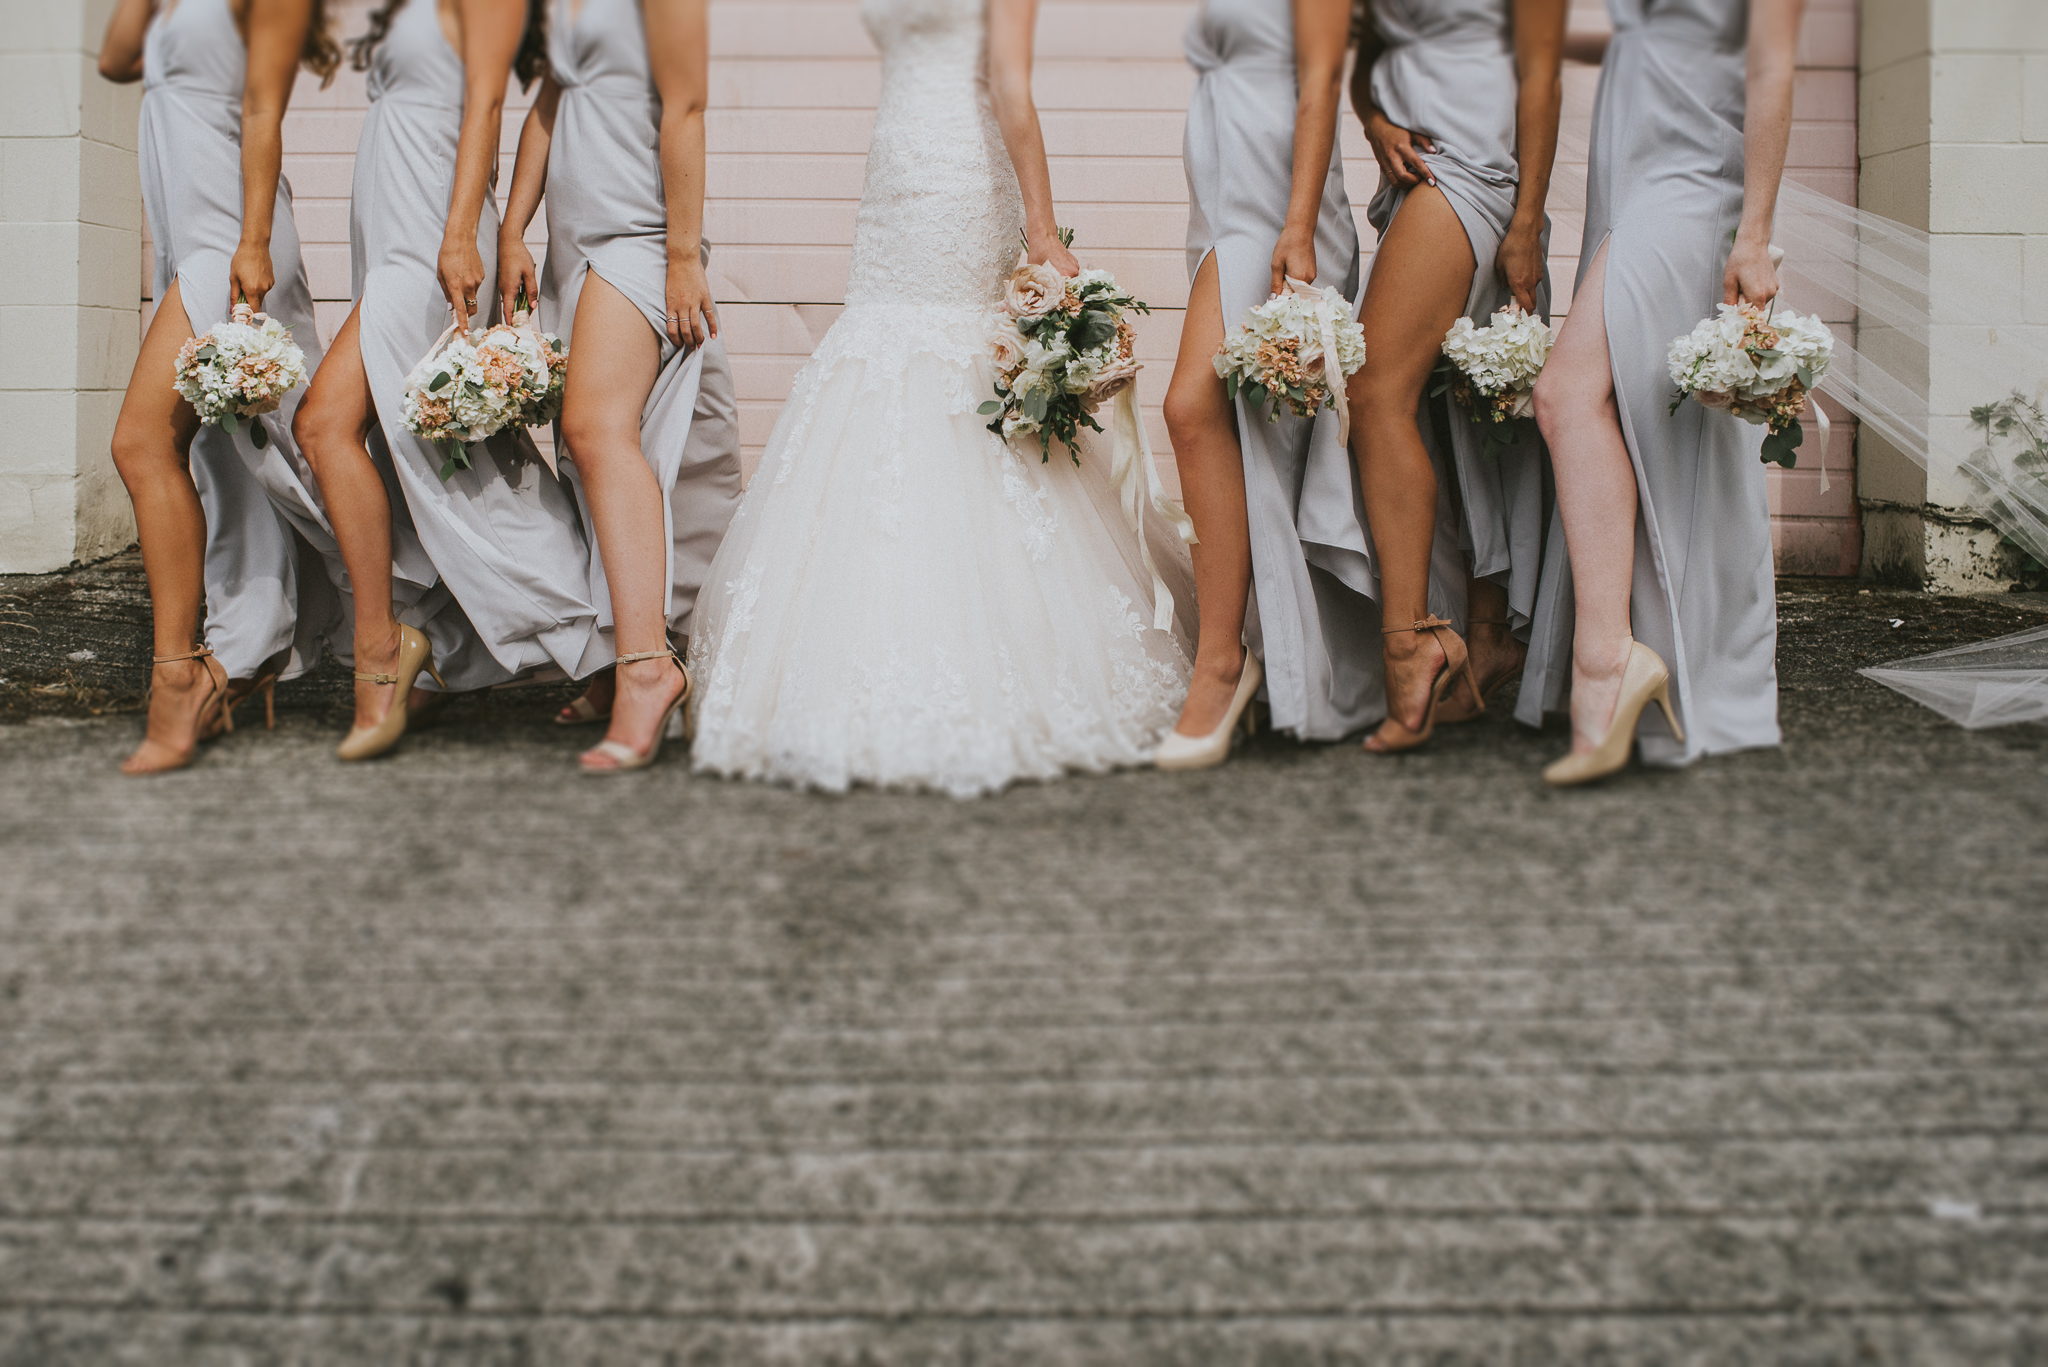 52-permanent-vancouver-wedding-courtneysteven-web-8260-ts.jpg